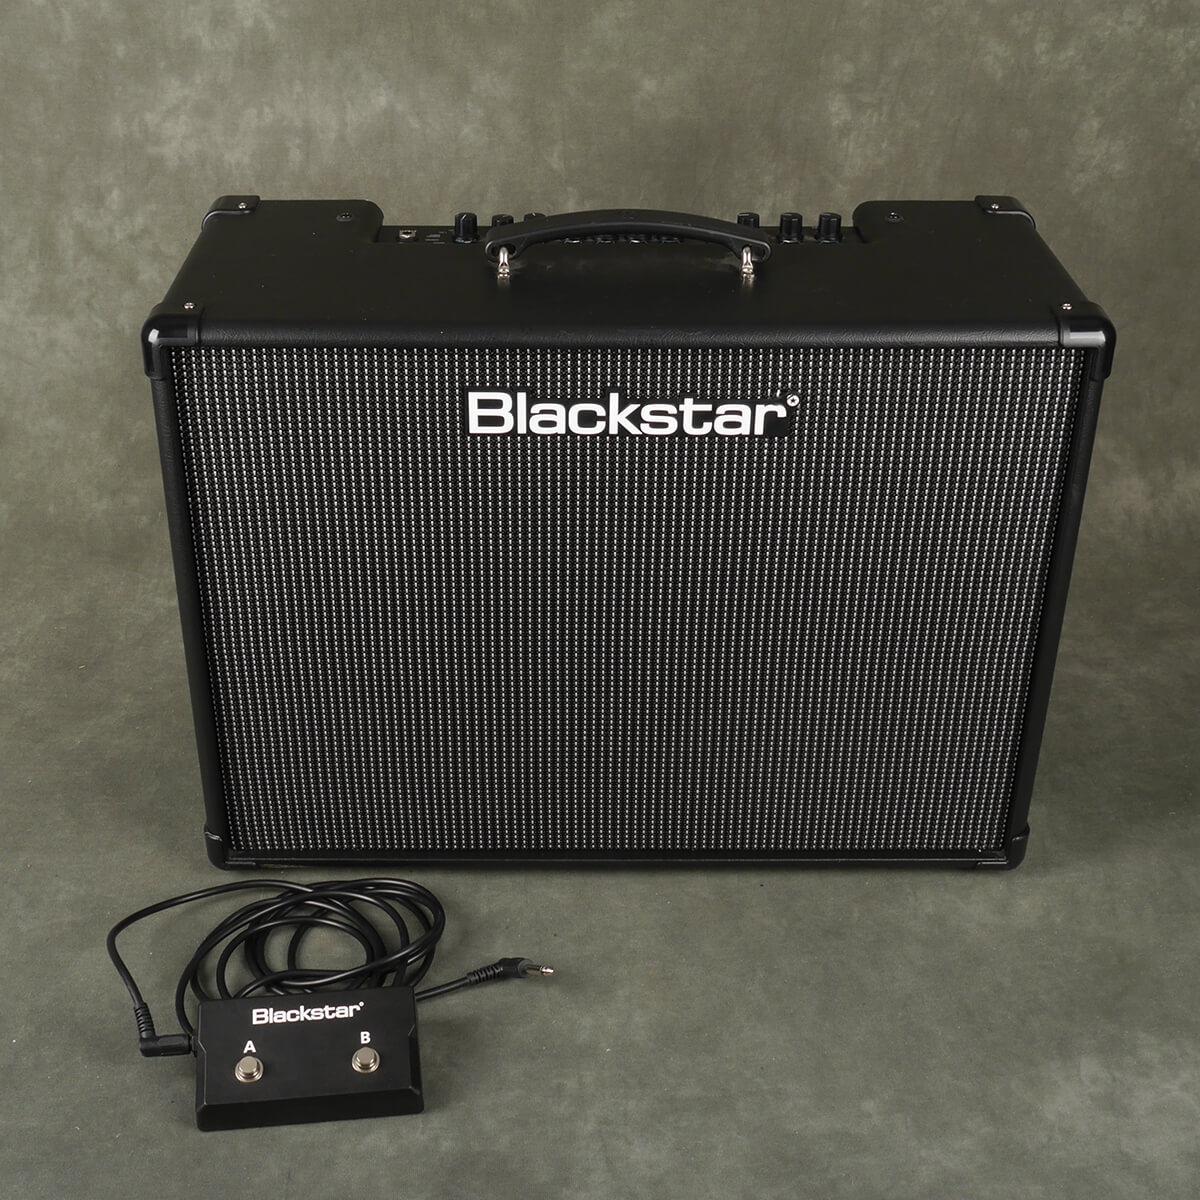 Blackstar ID Core 100 & Looper Footswitch - 2nd Hand